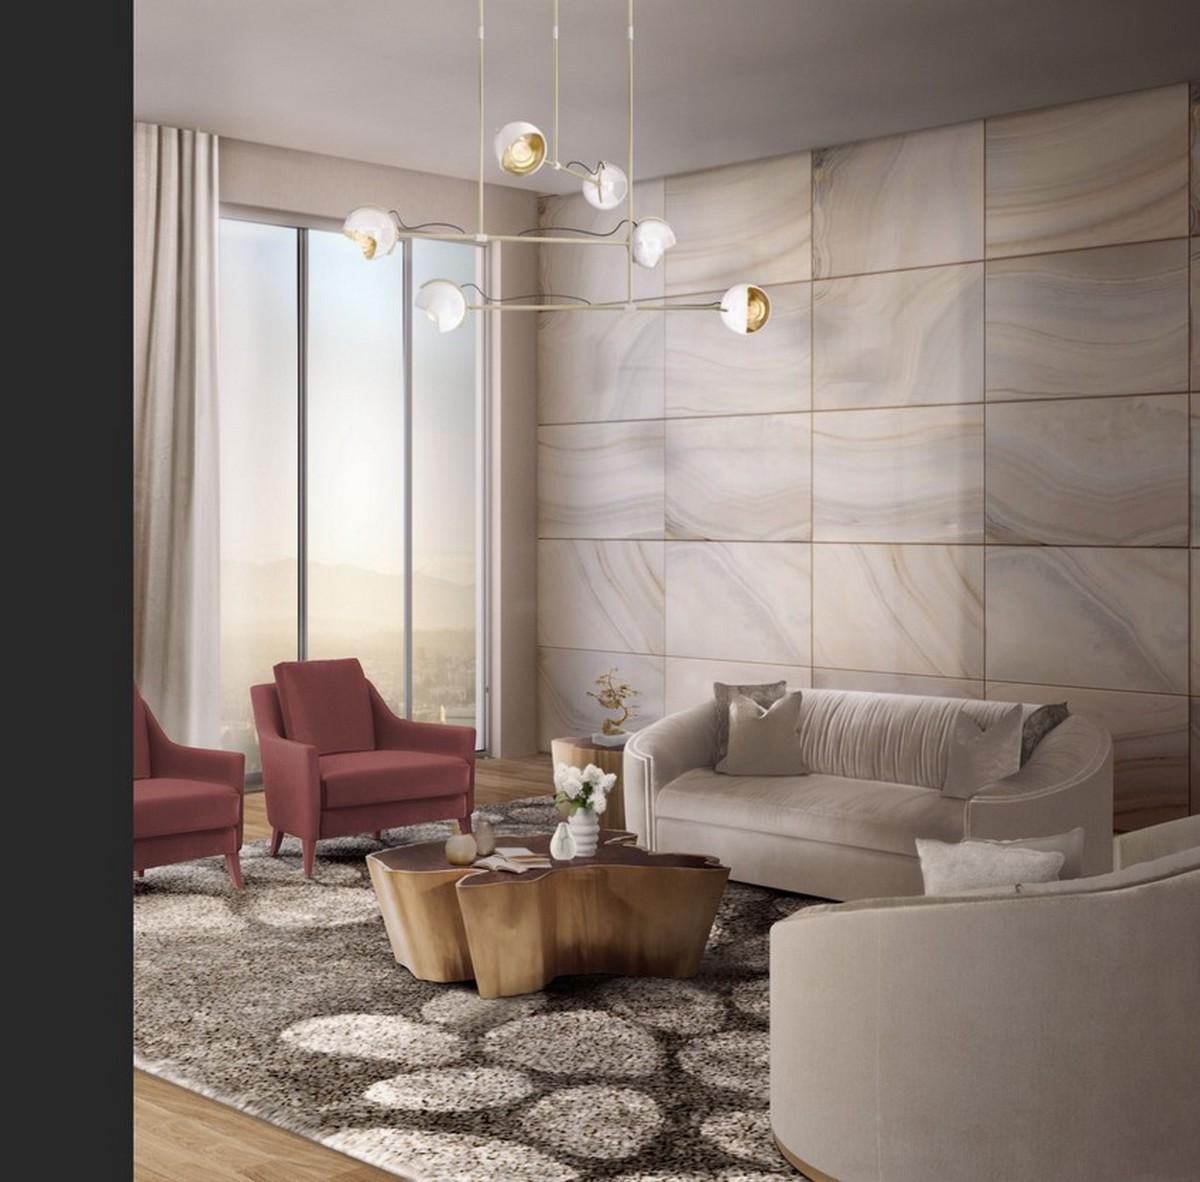 Diseños de Interiores inspirados en Naturaleza: ideas para cambiar un proyecto diseño de interiores Diseño de Interiores inspirados en Naturaleza: ideas para cambiar un proyecto KfsKyVIA